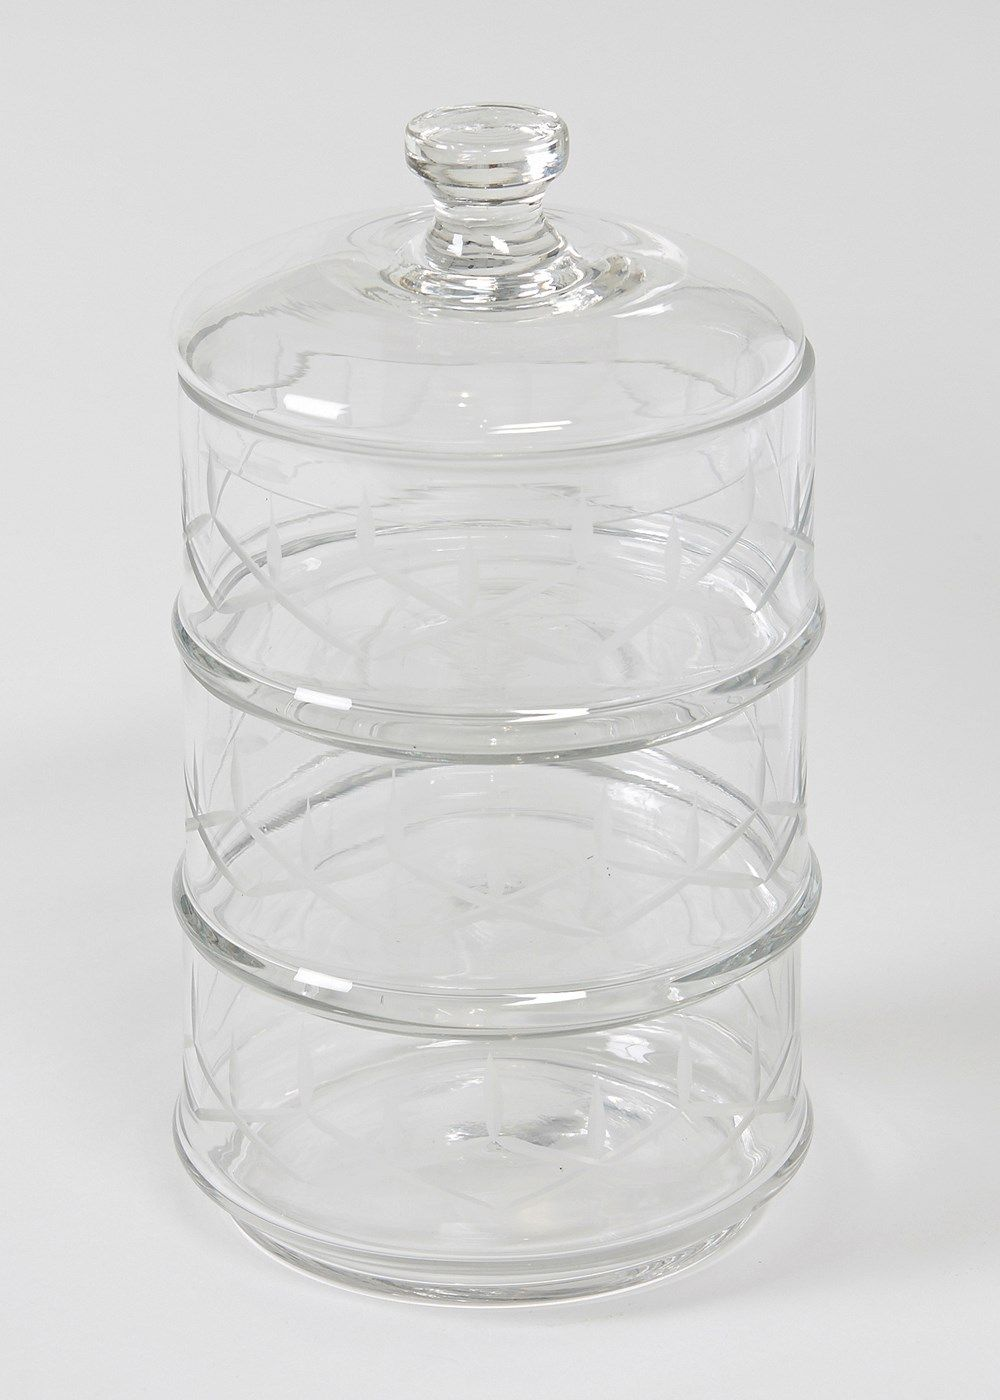 Bathroom Modern Bathroom Fittings Decor Crystal And Glassware